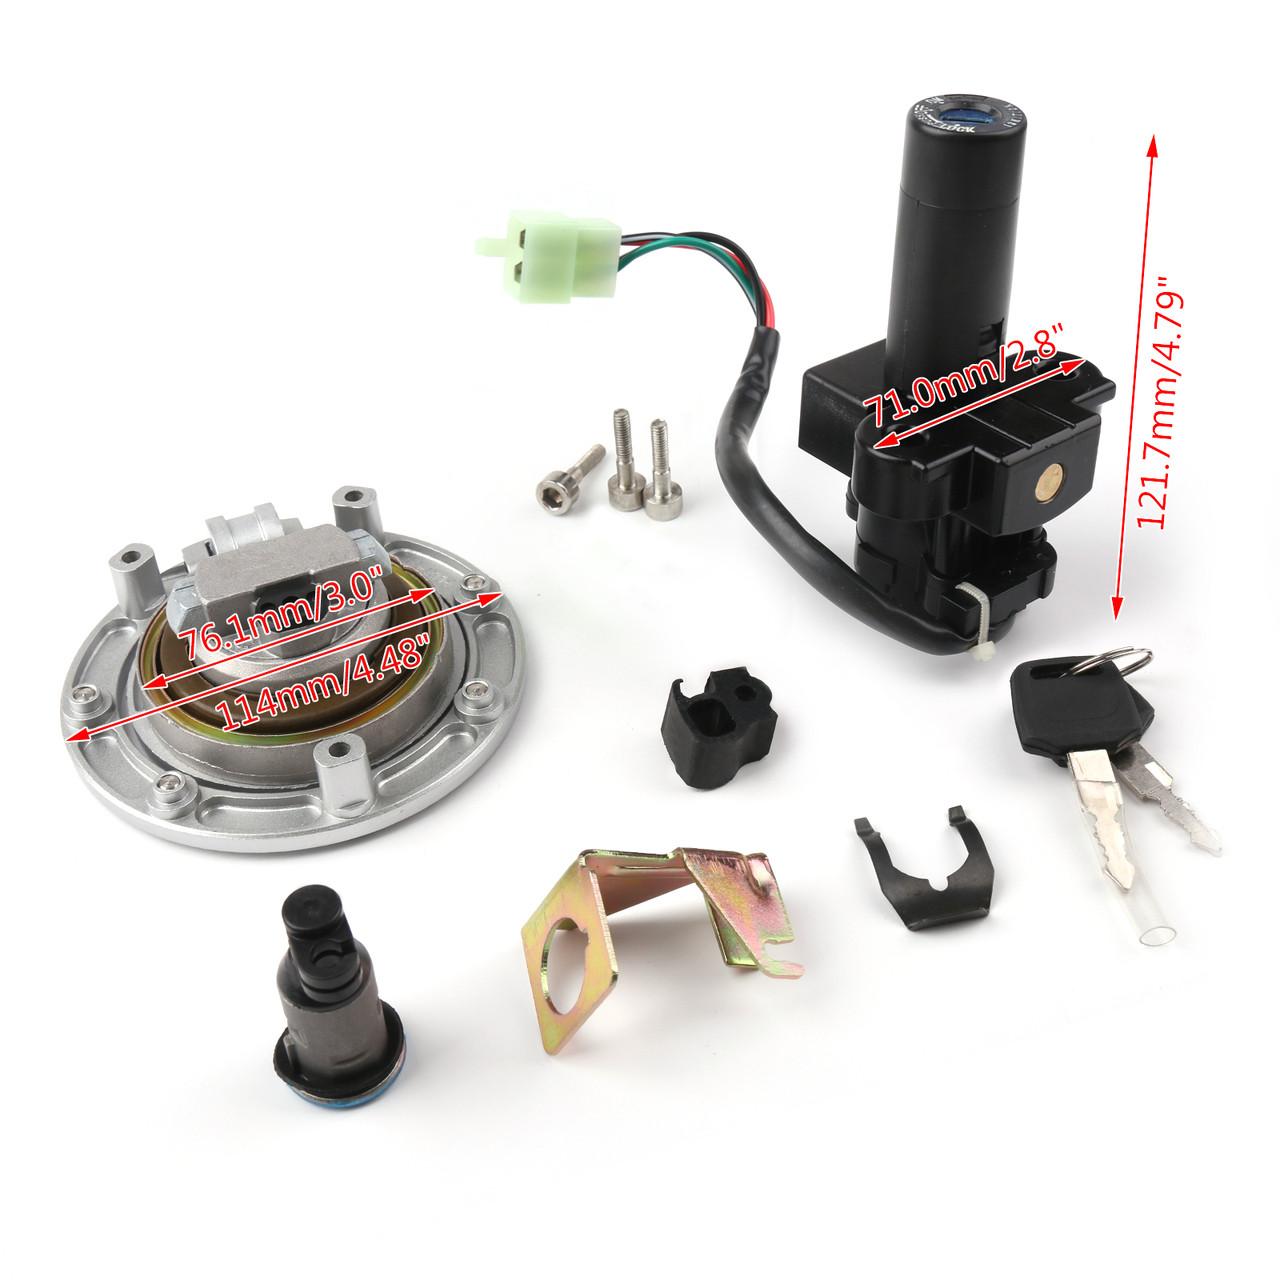 Ignition Switch Lock Fuel Gas Cap Key Set For Honda CB750 F2 92-01 CB1300 98-02